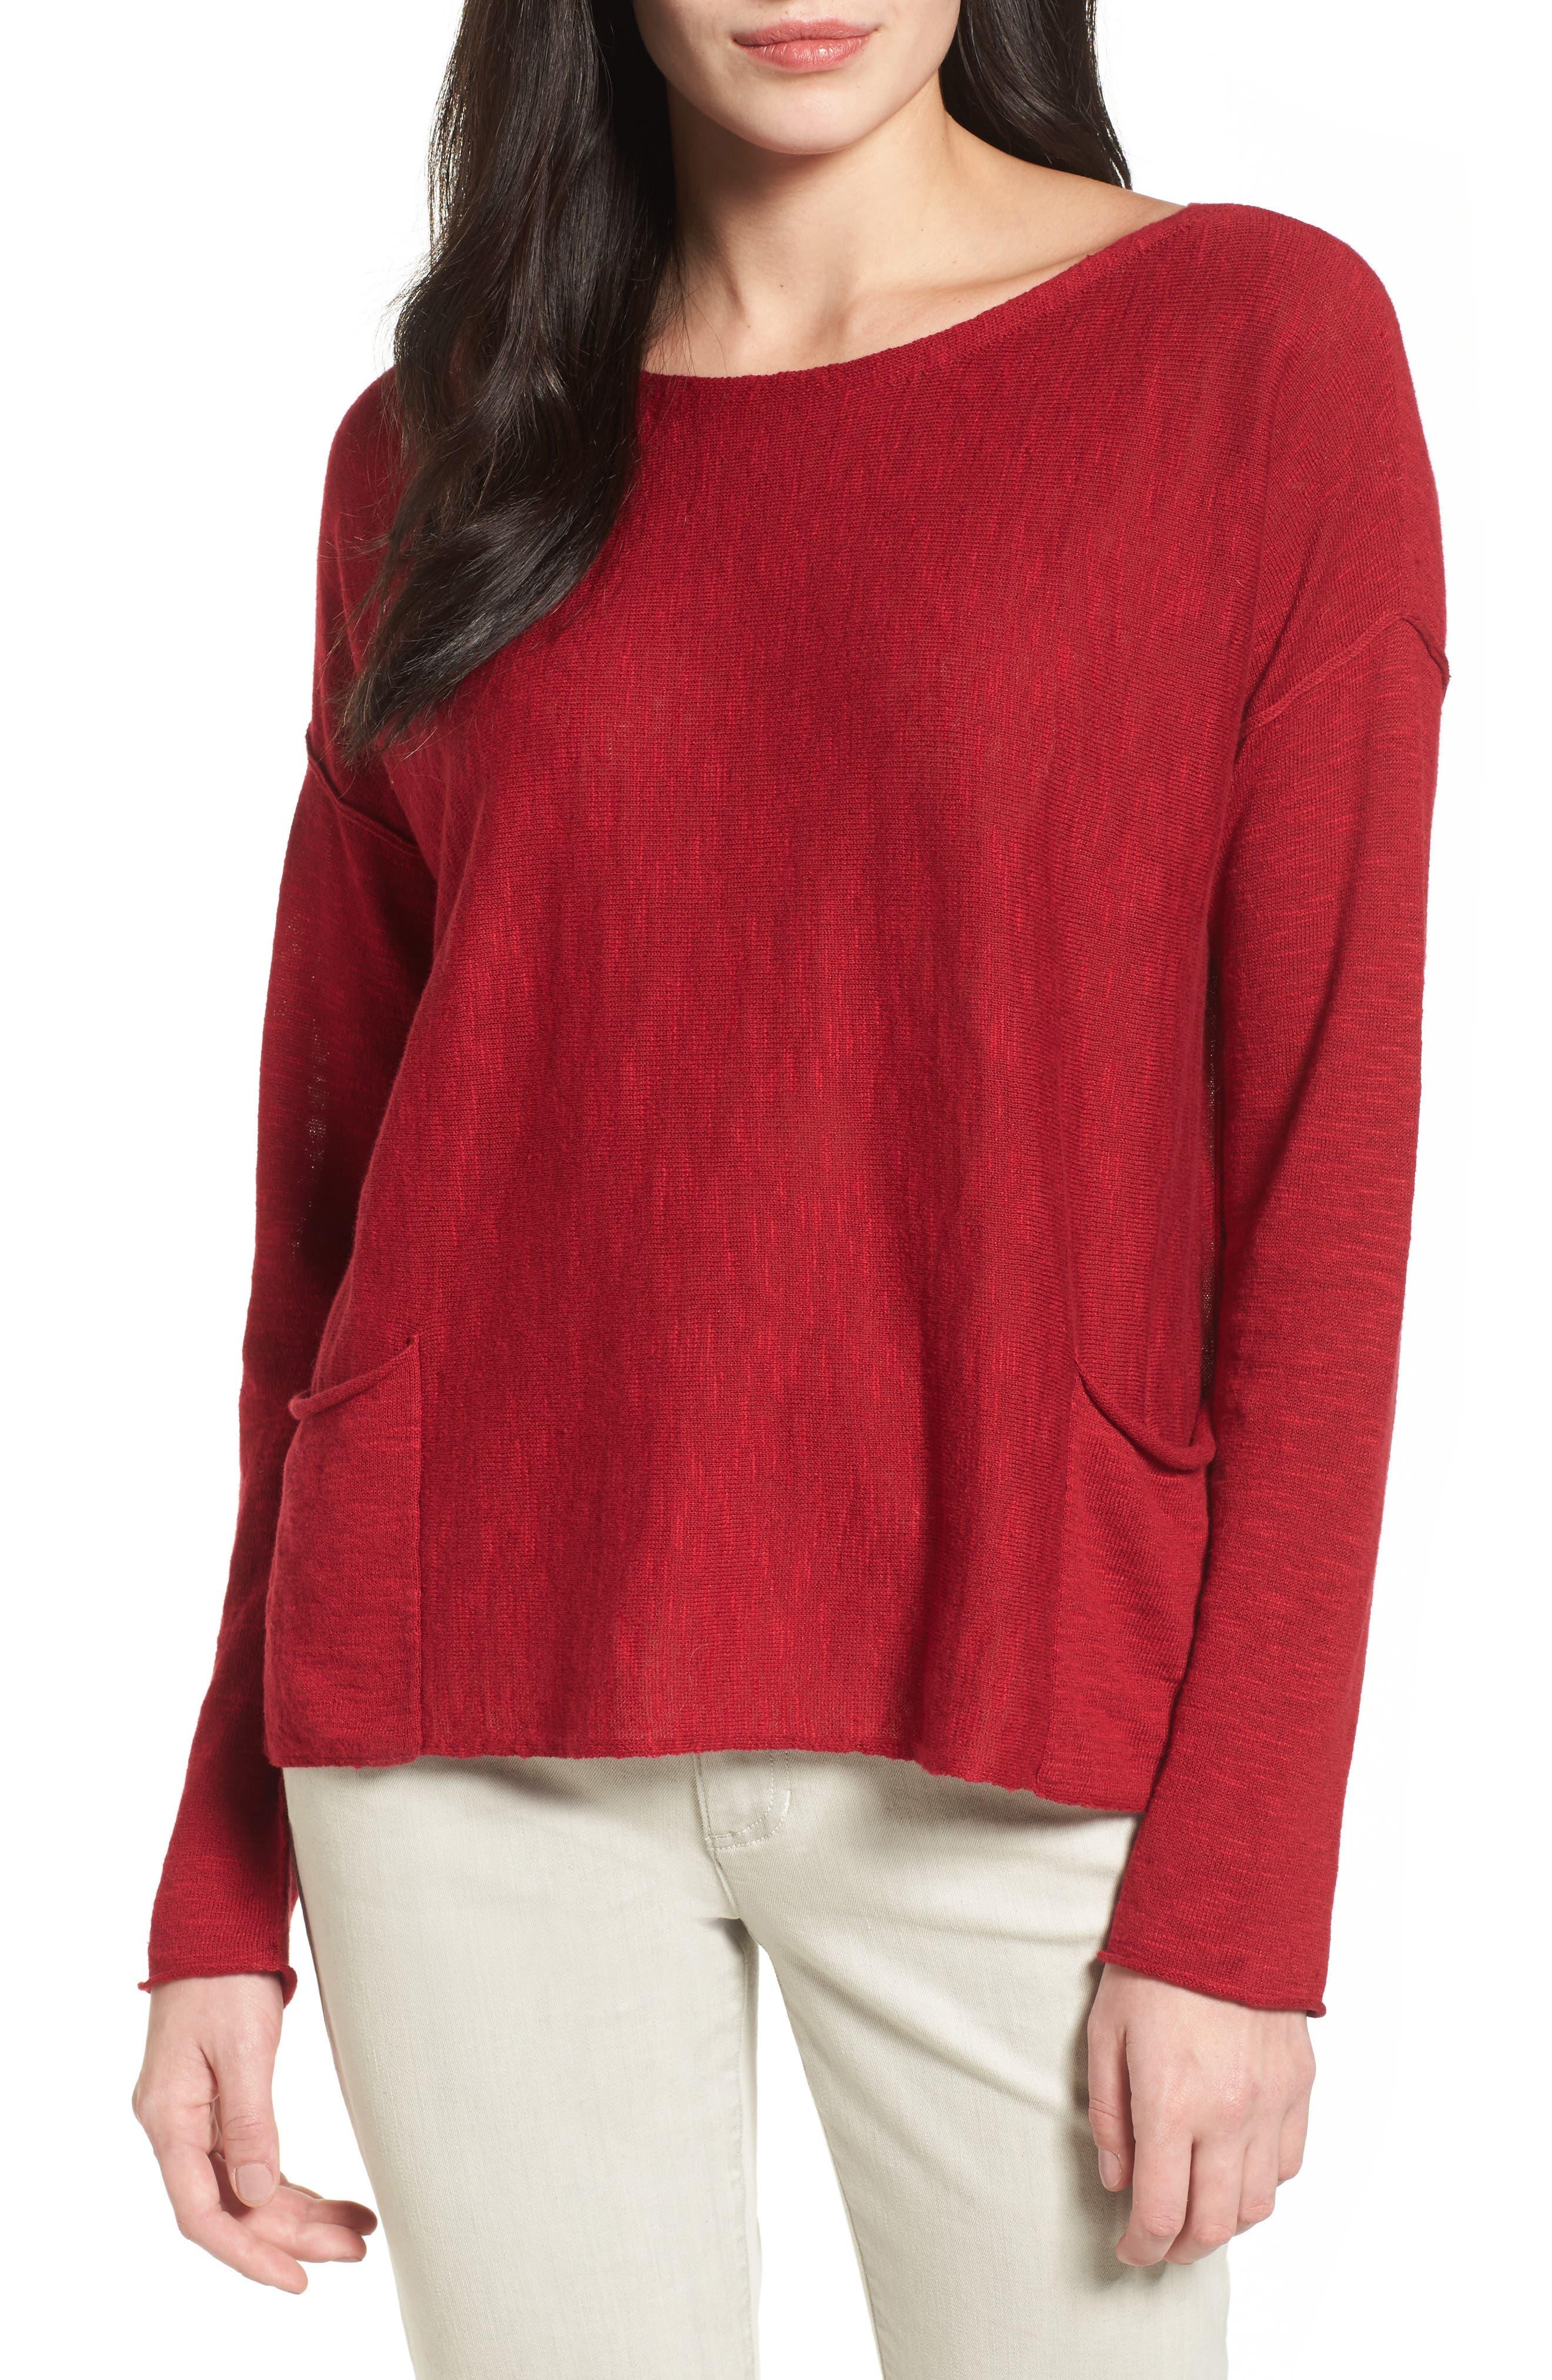 Eileen Fisher Organic Linen & Cotton Knit Boxy Top